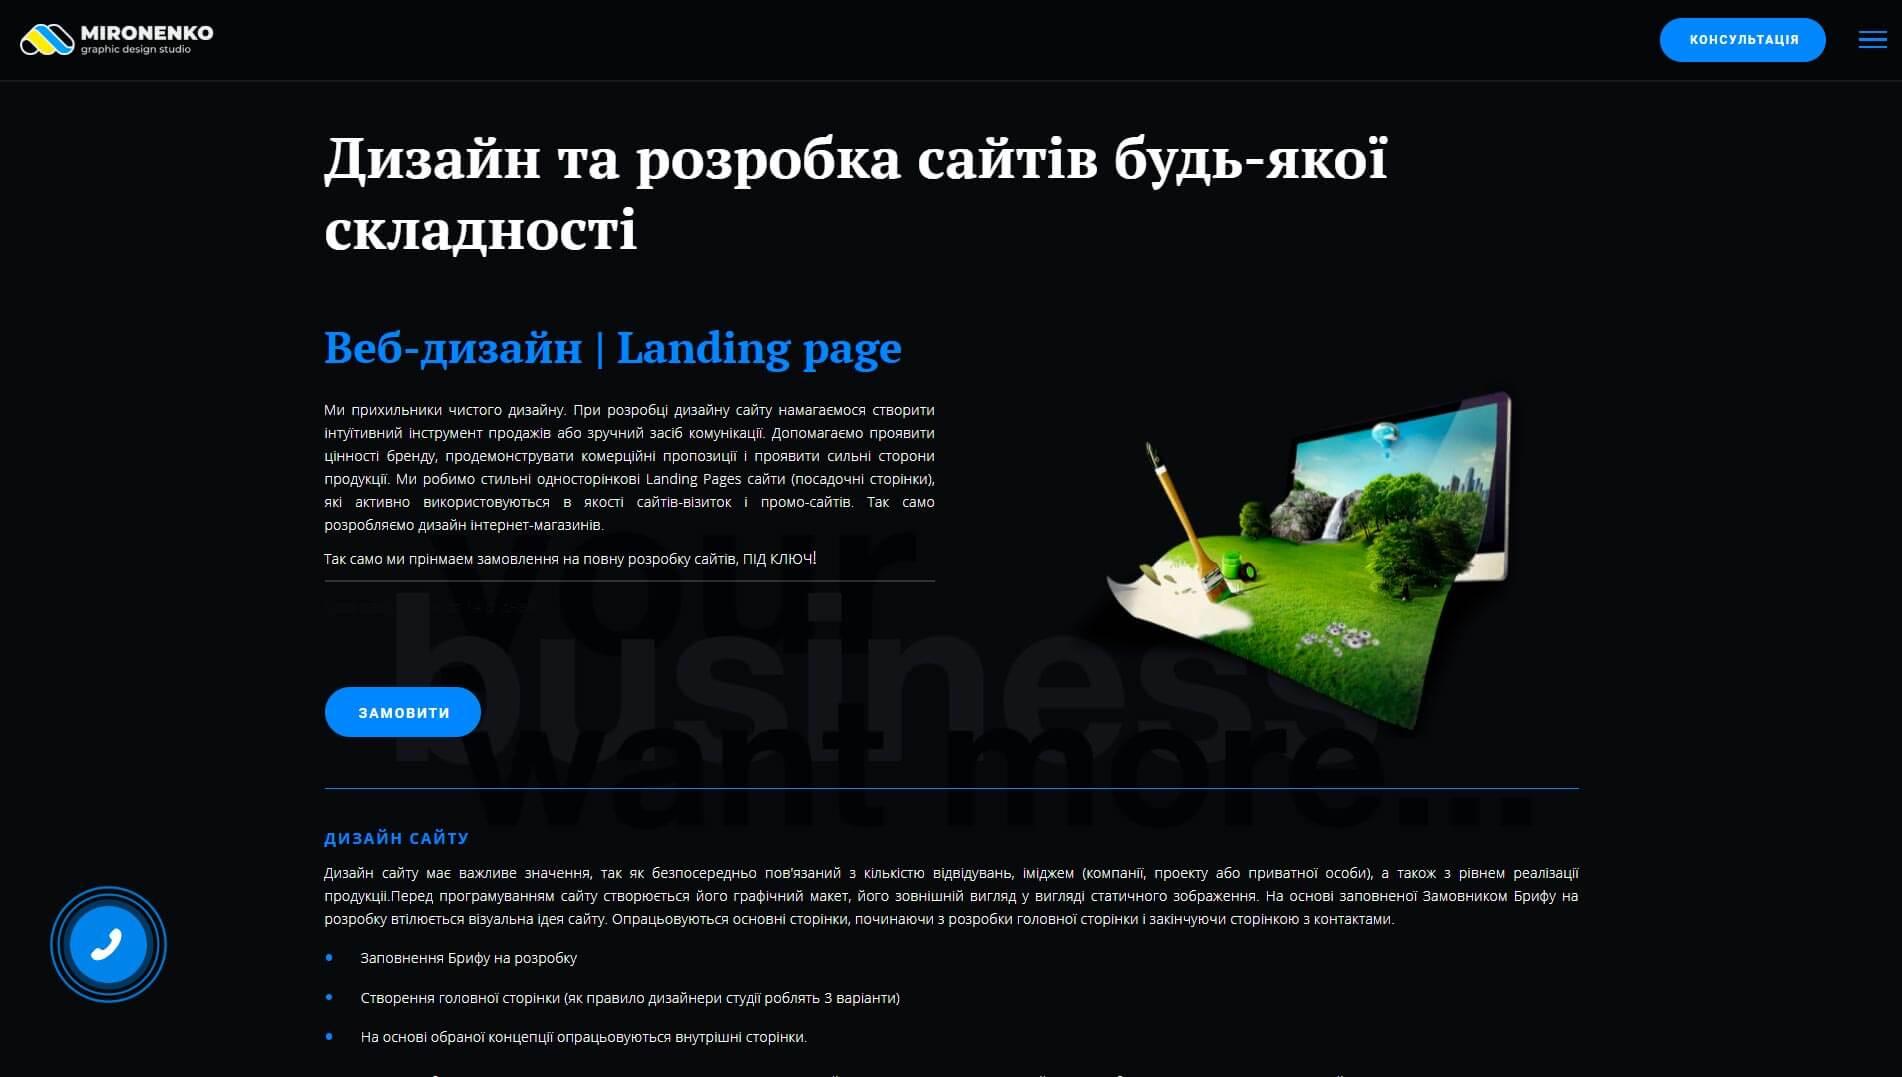 Mironenko - обзор компании, услуги, отзывы, клиенты, Фото № 3 - google-seo.pro